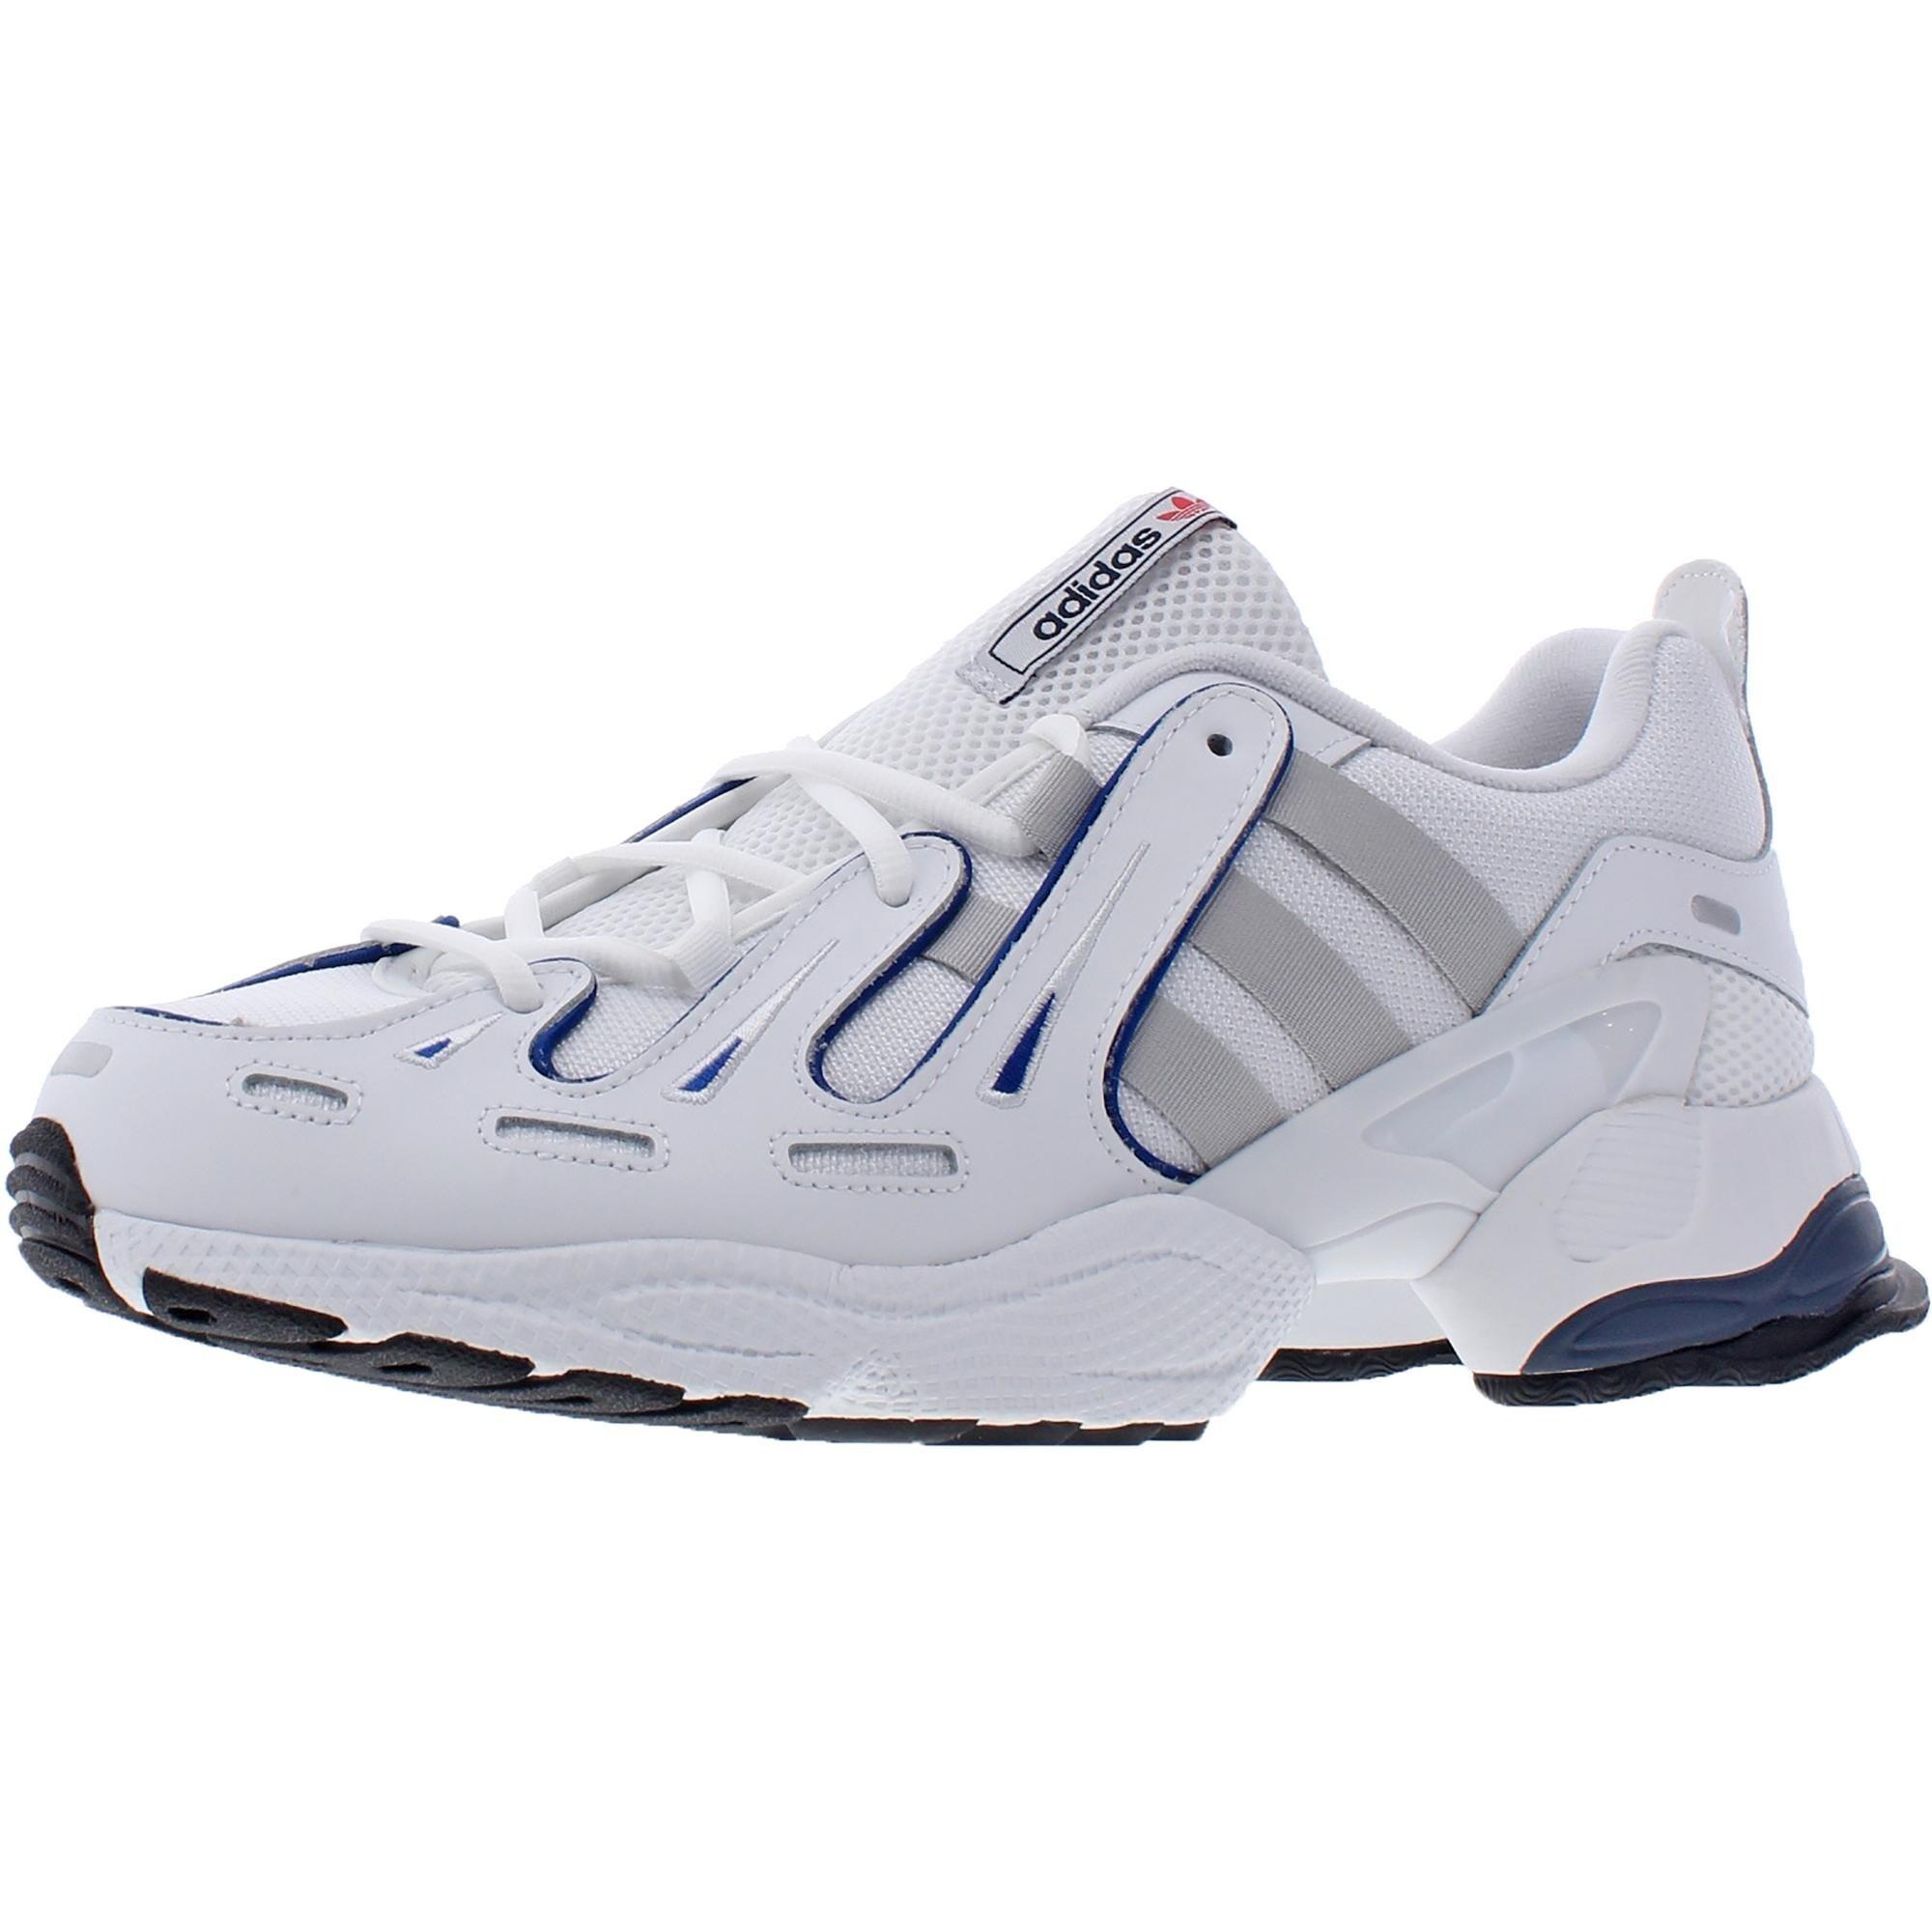 adidas Originals Mens EQT Gazelle Walking Shoes Mesh Trail - Footwear White/Grey Two/Collegiate Royal